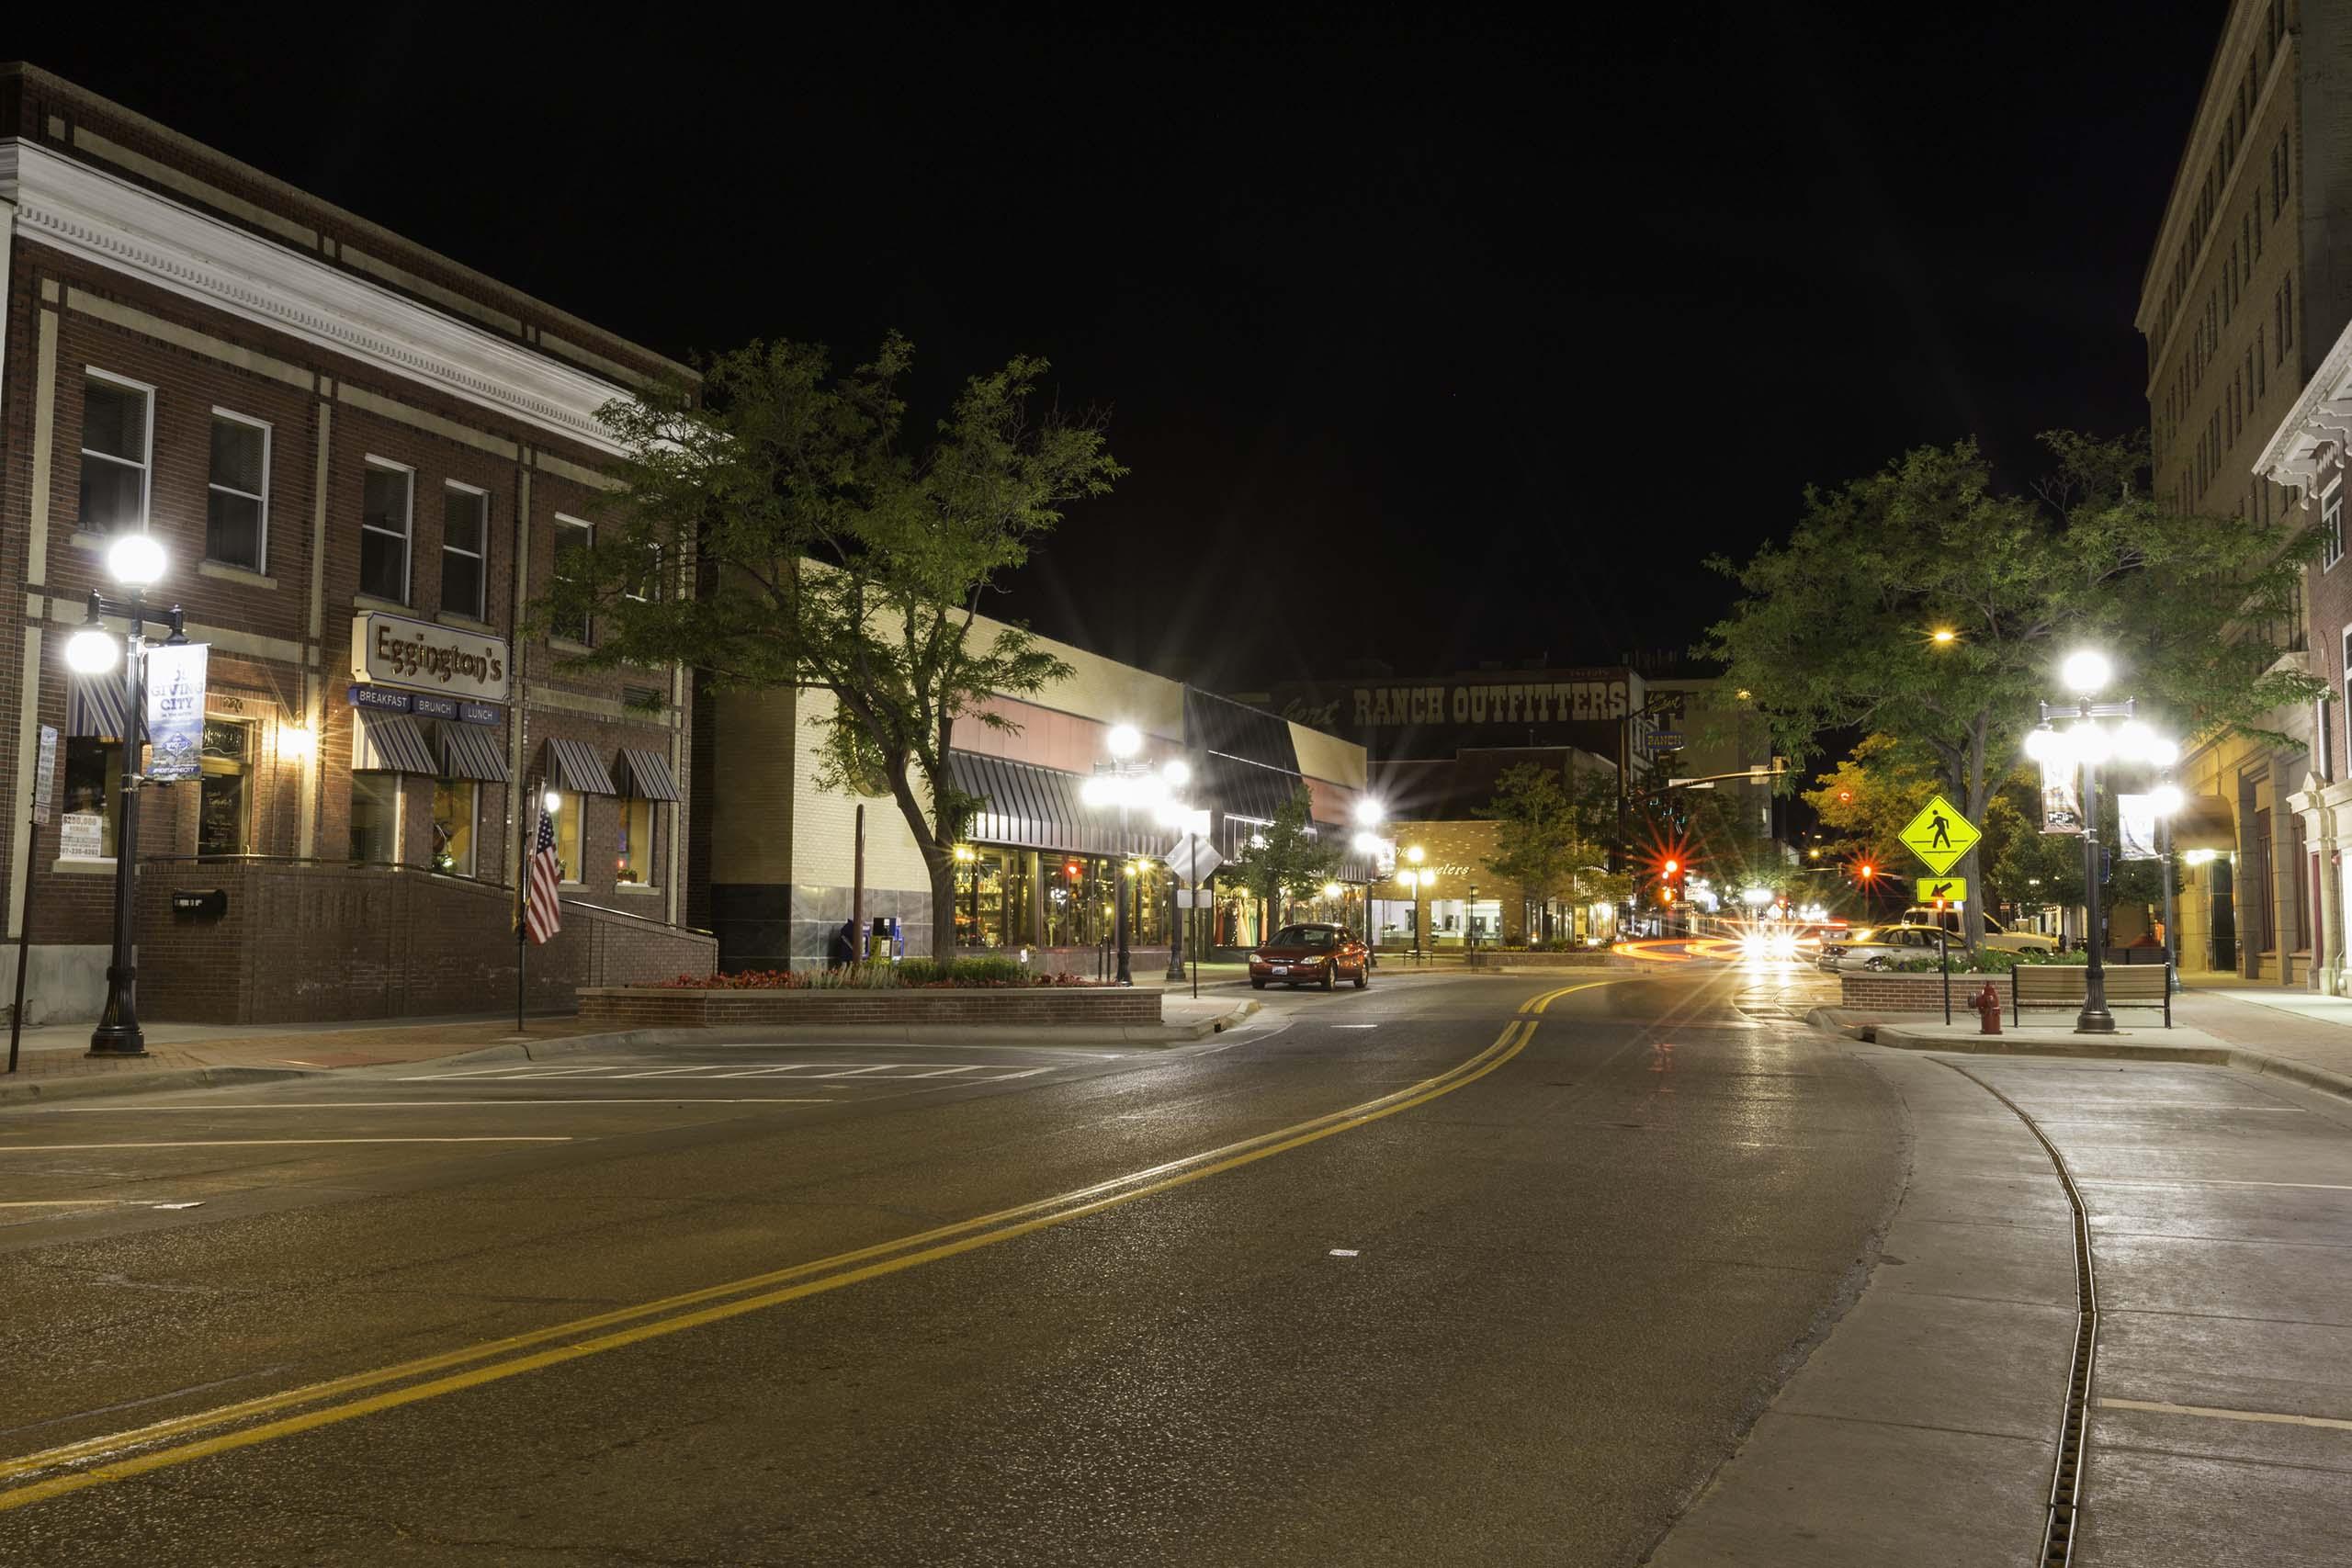 Downtown Casper Nighttime Downtown Development Authority